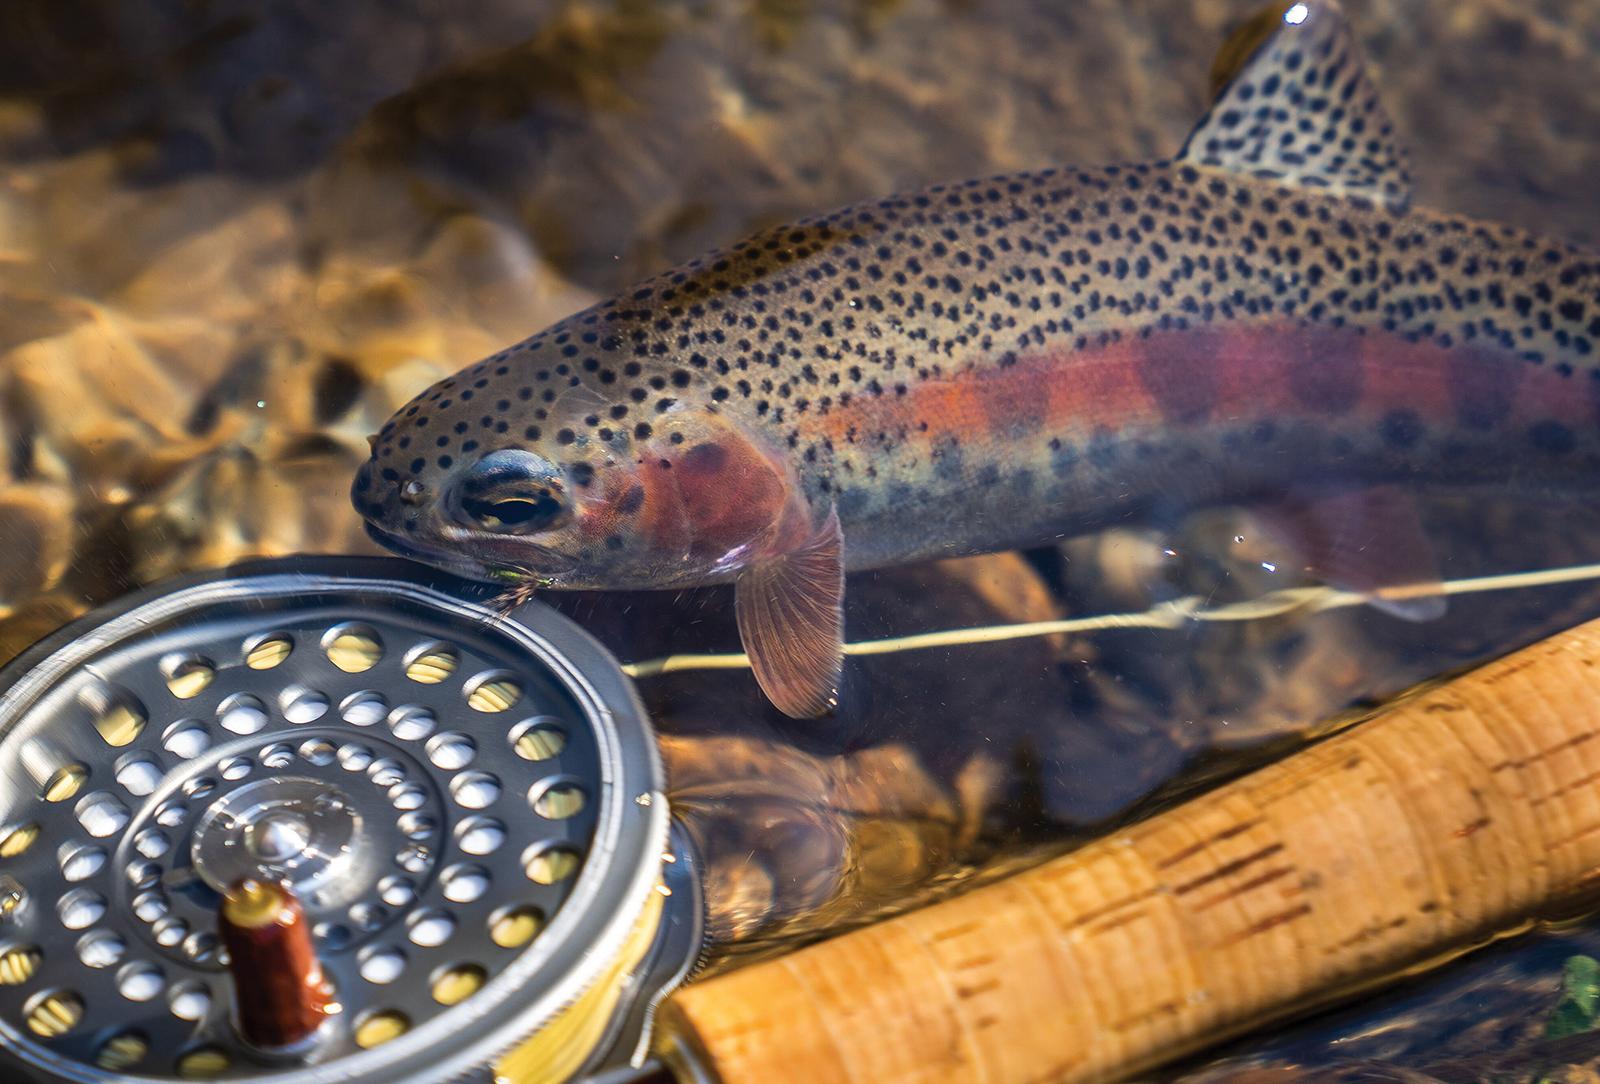 highlands nc cashiers nc fishing classic bow